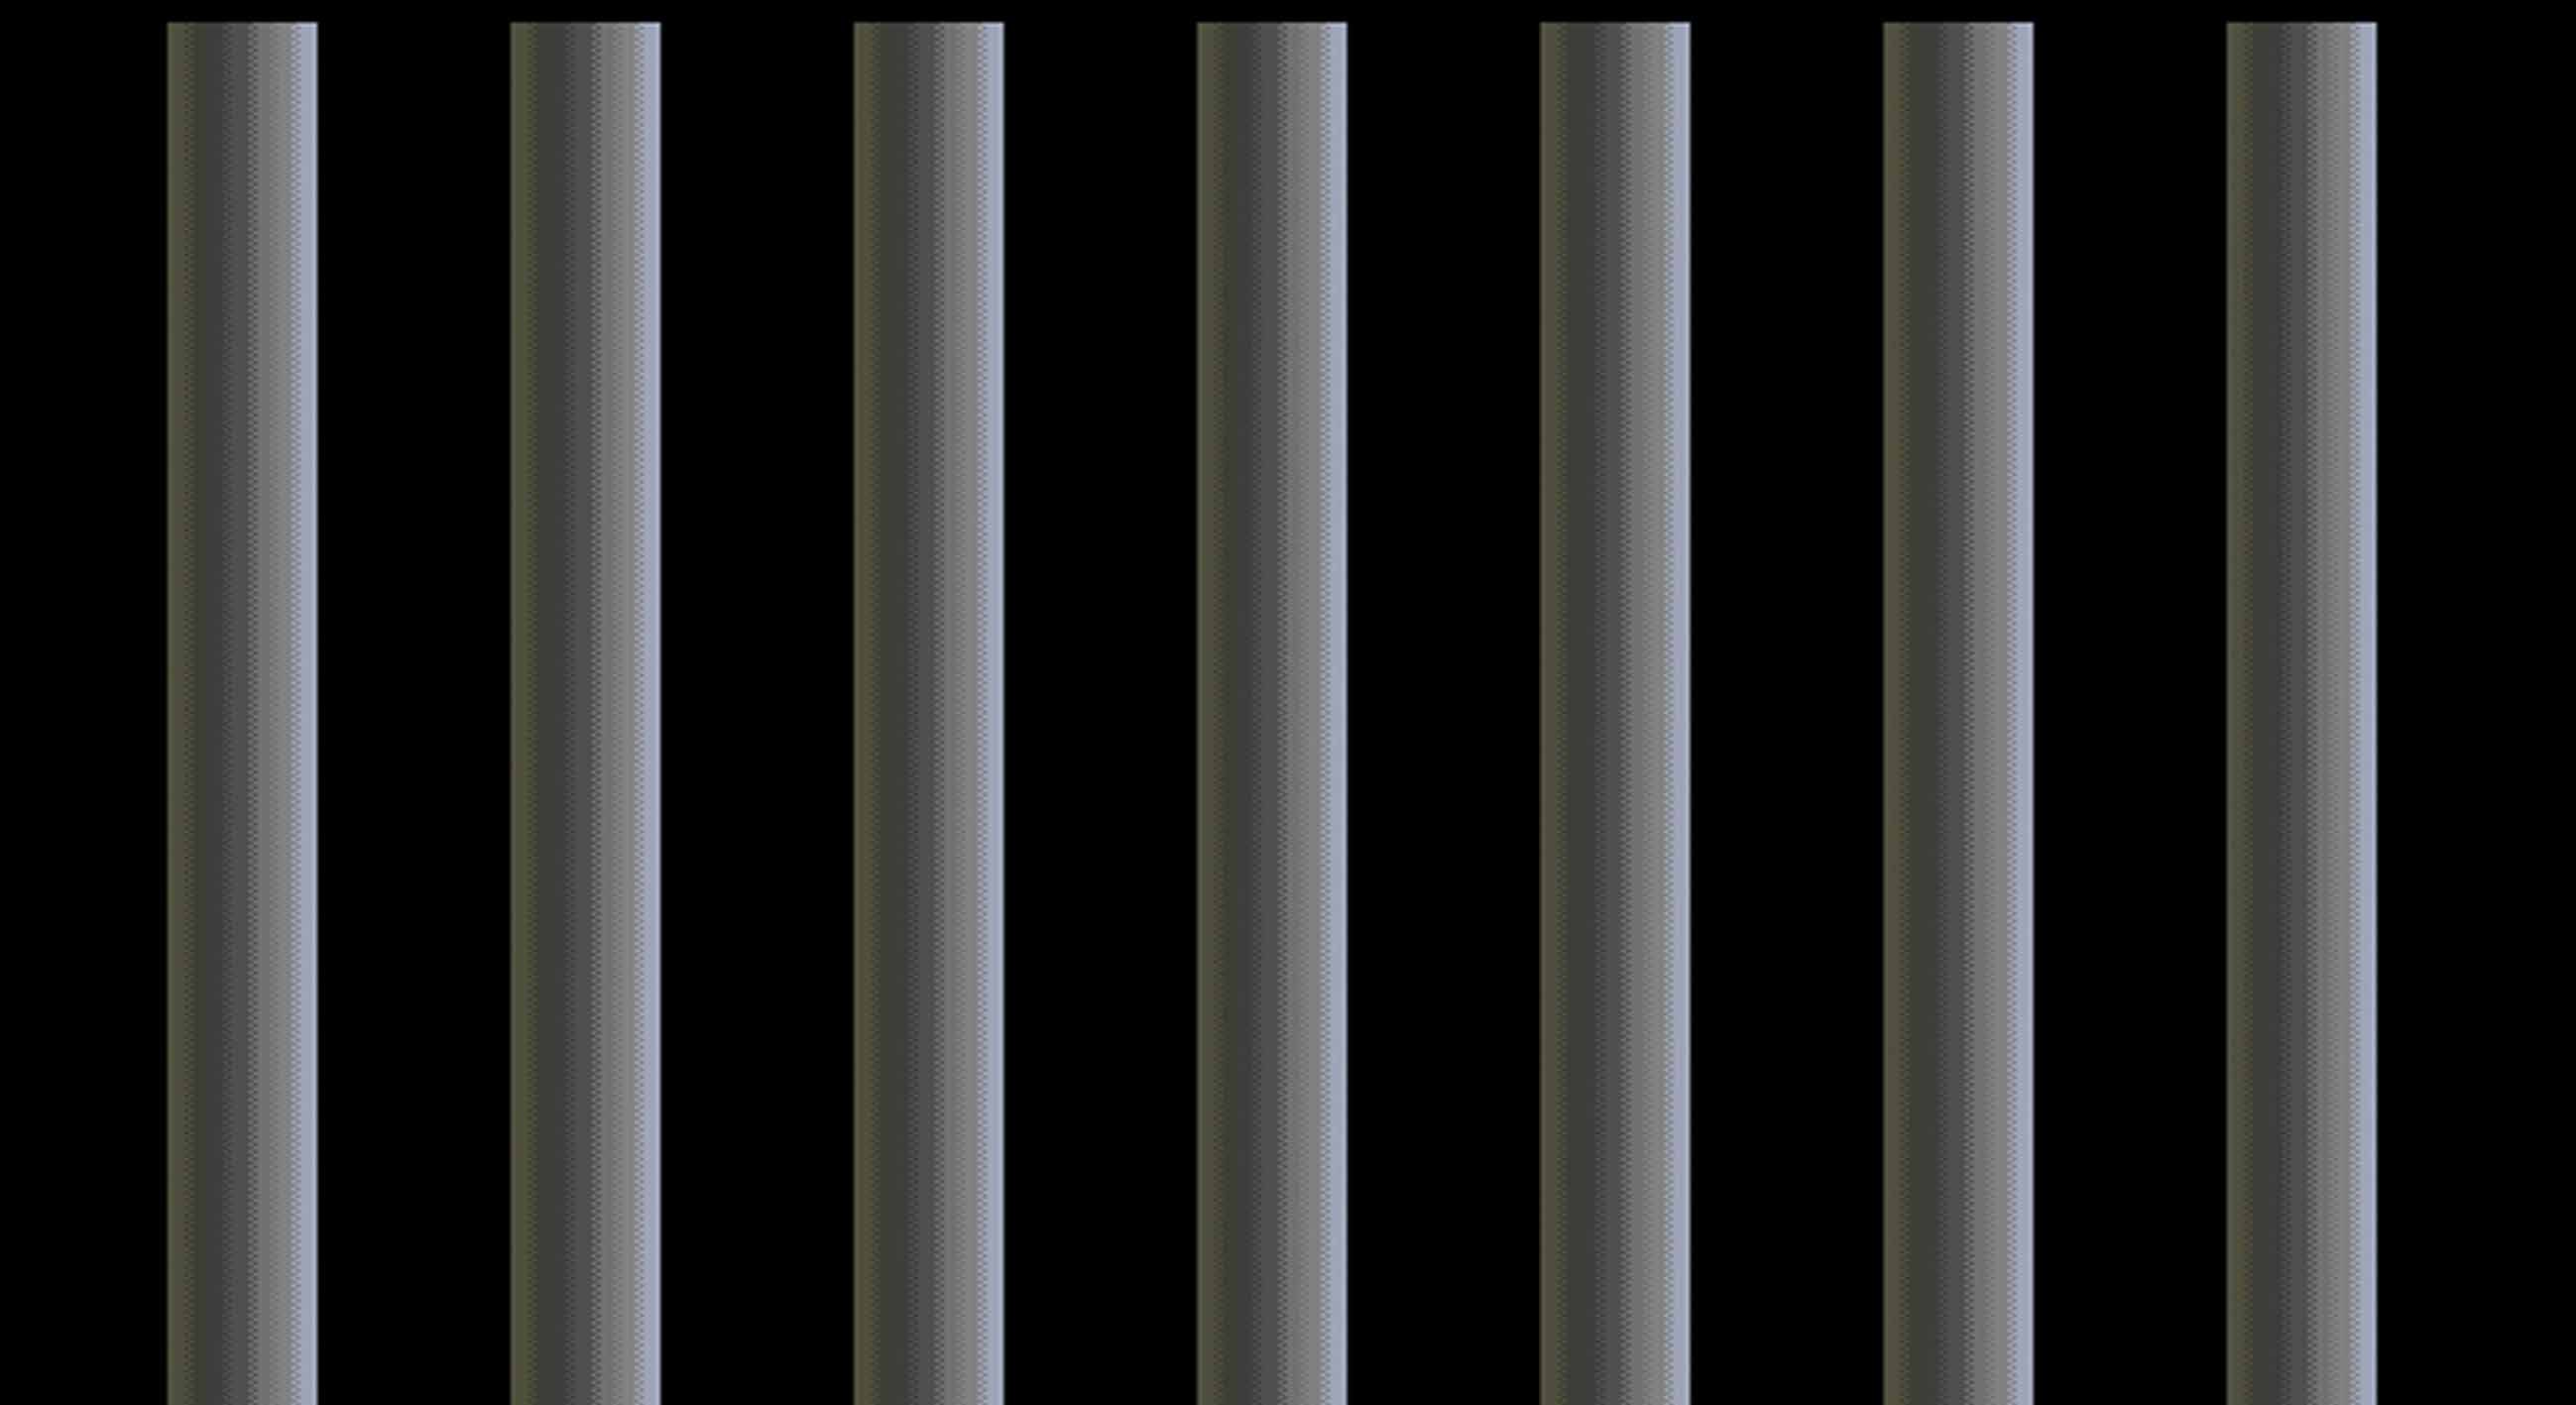 Jail Bars Clipart.